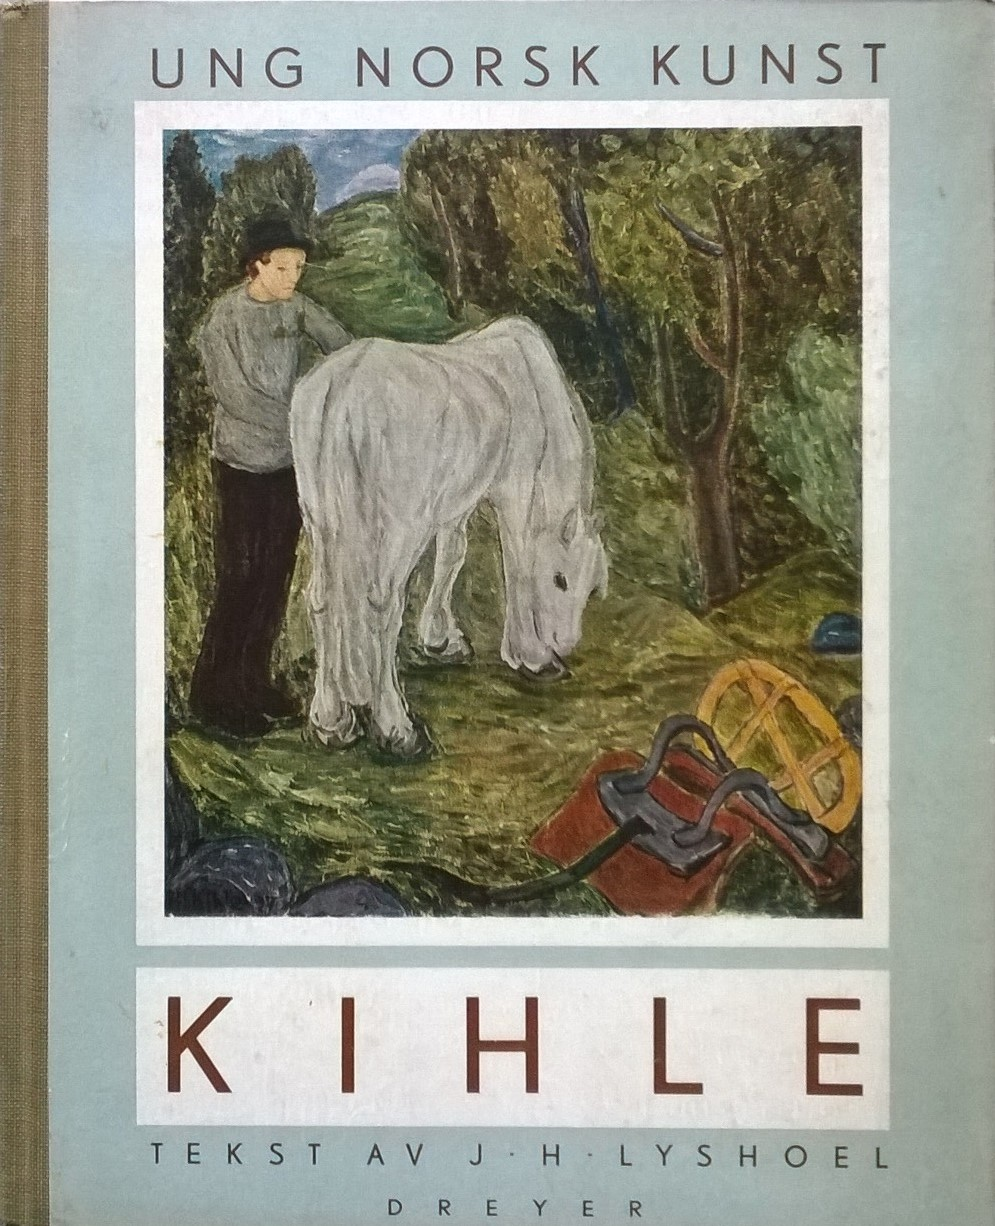 Lyshoel, J.H. Harald Kihle